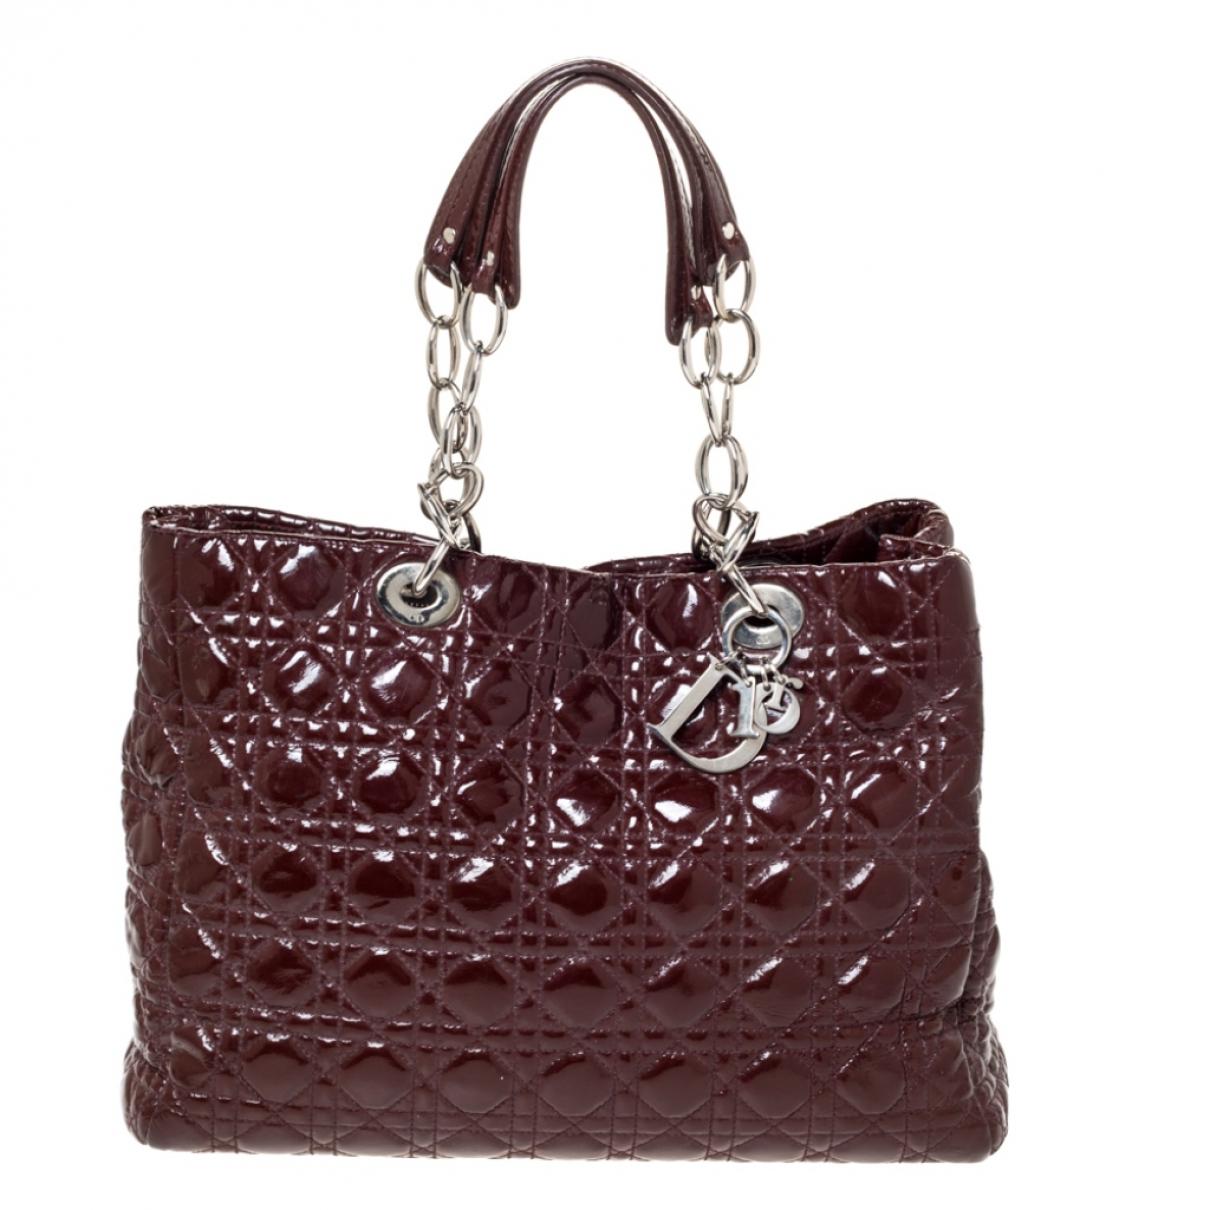 Dior N Burgundy Patent leather handbag for Women N